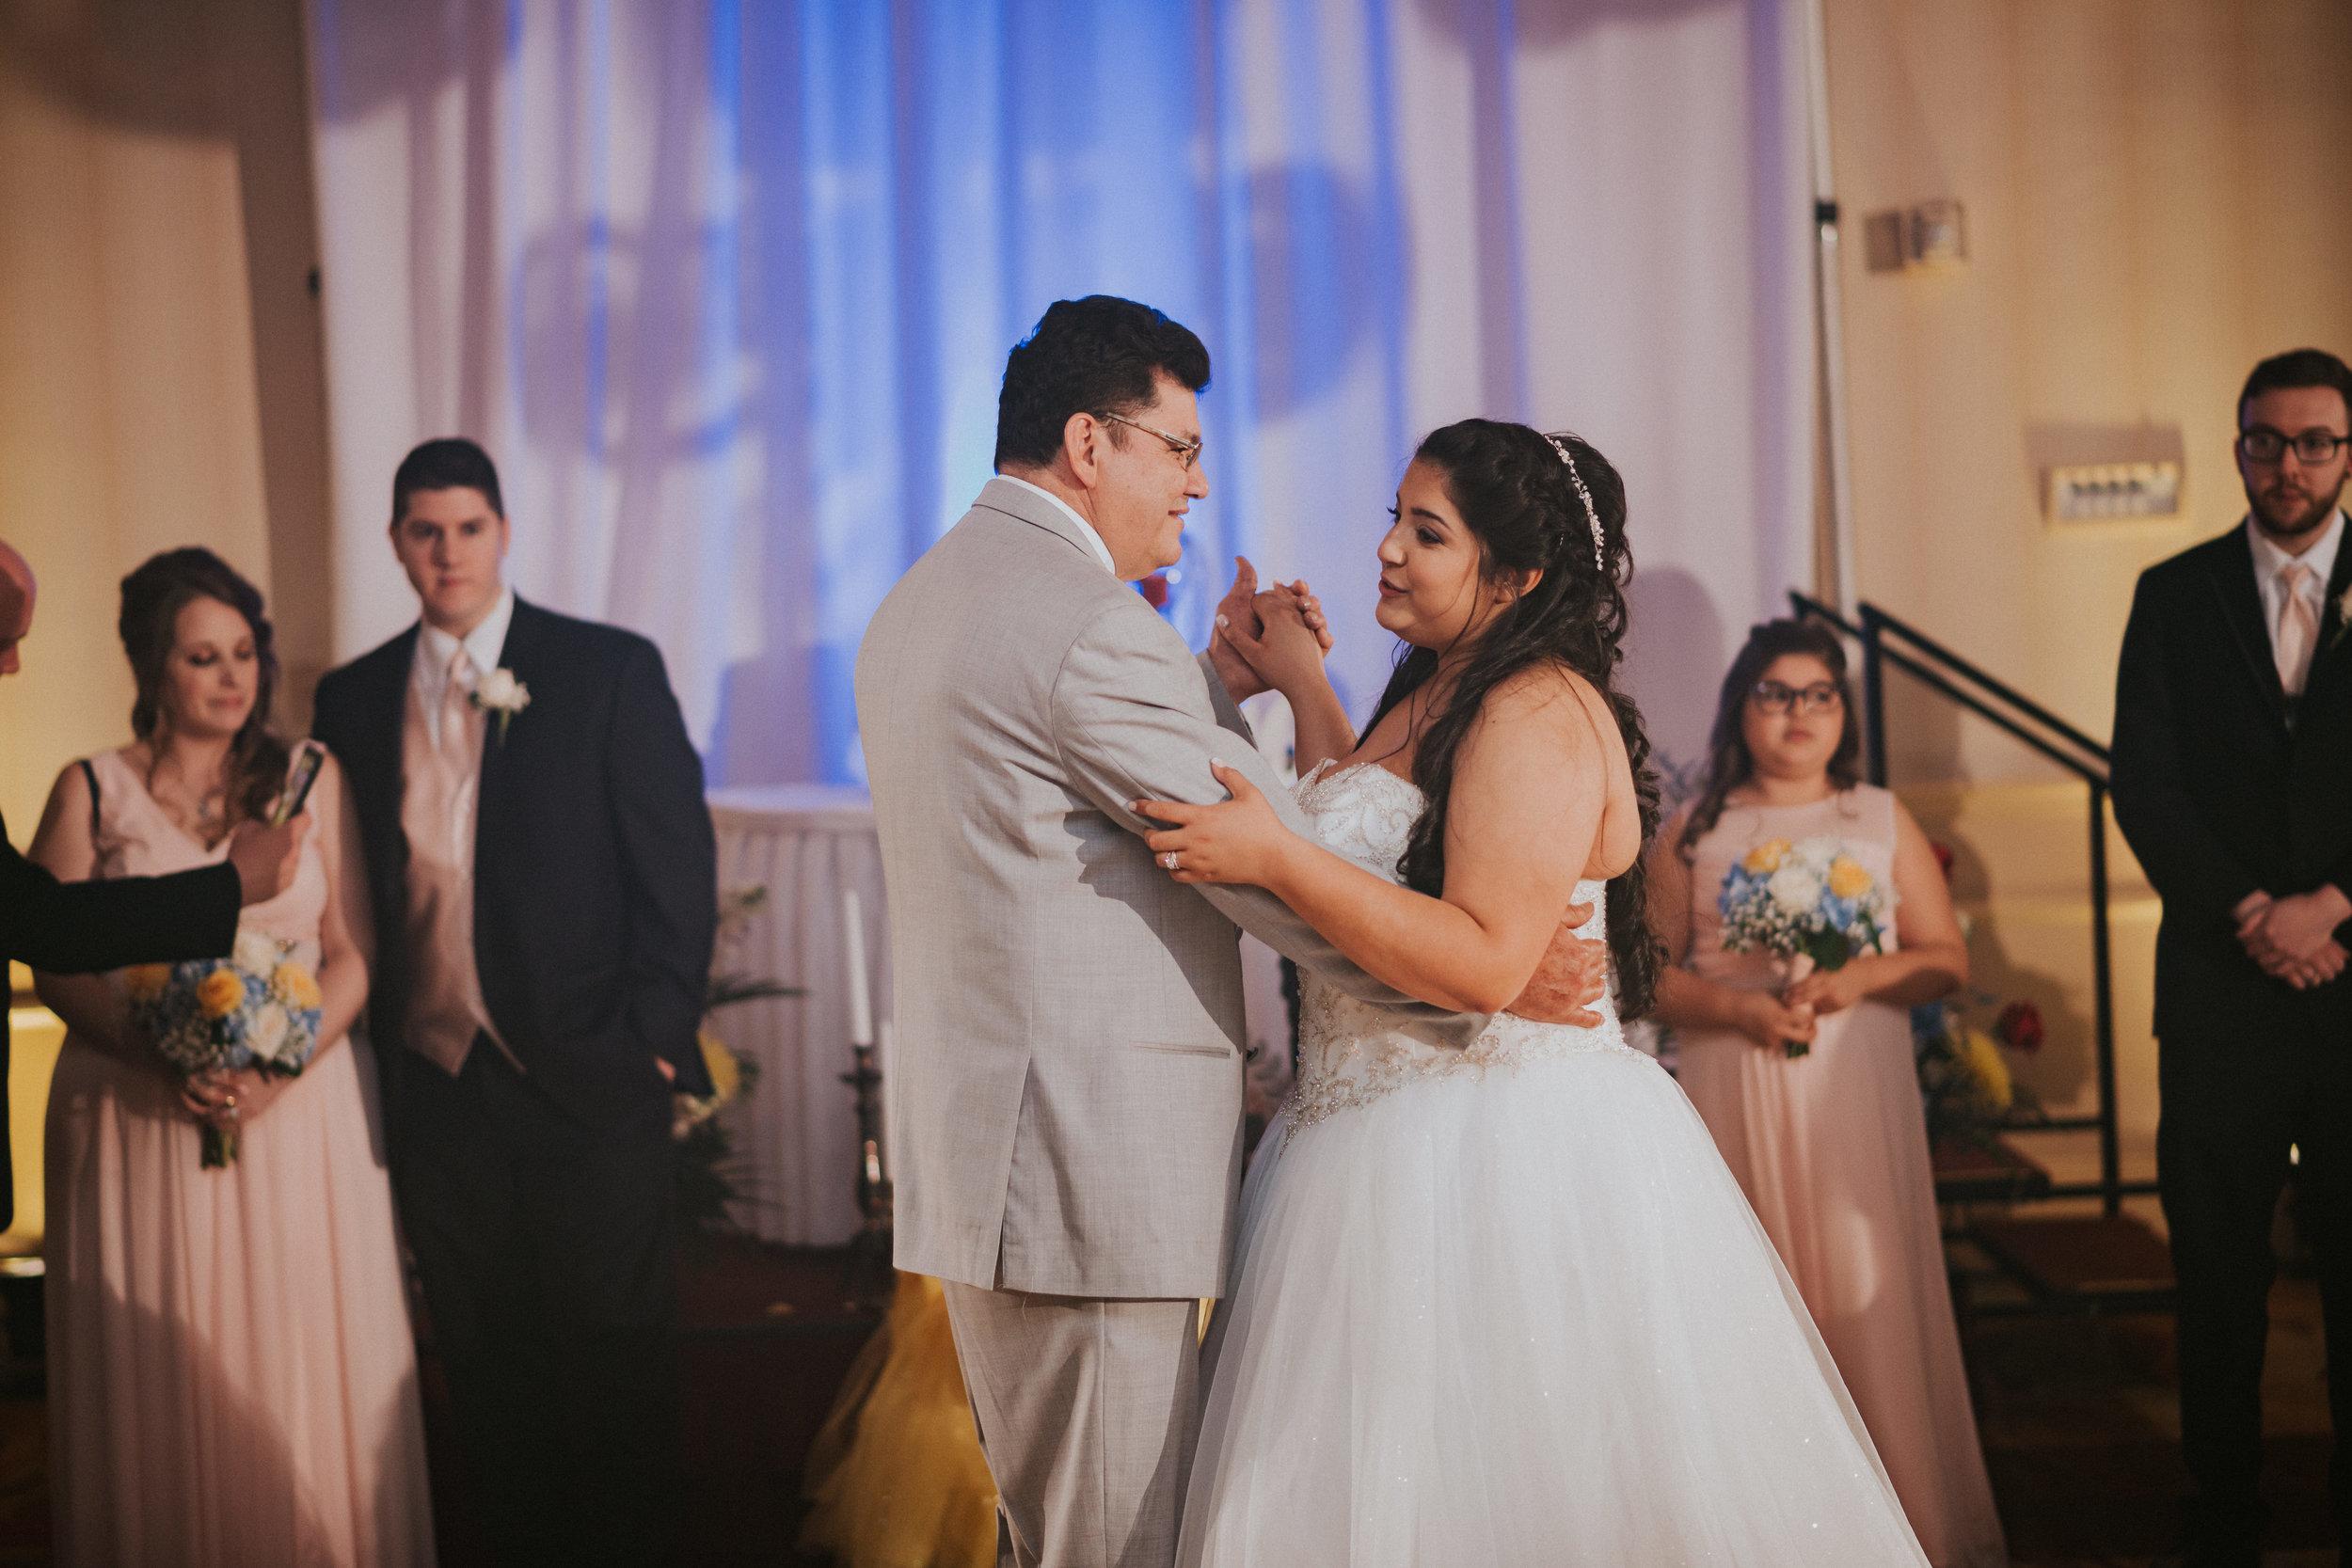 Barclay-Farmstead-Wedding-Rosa-and-Mike-547.jpg